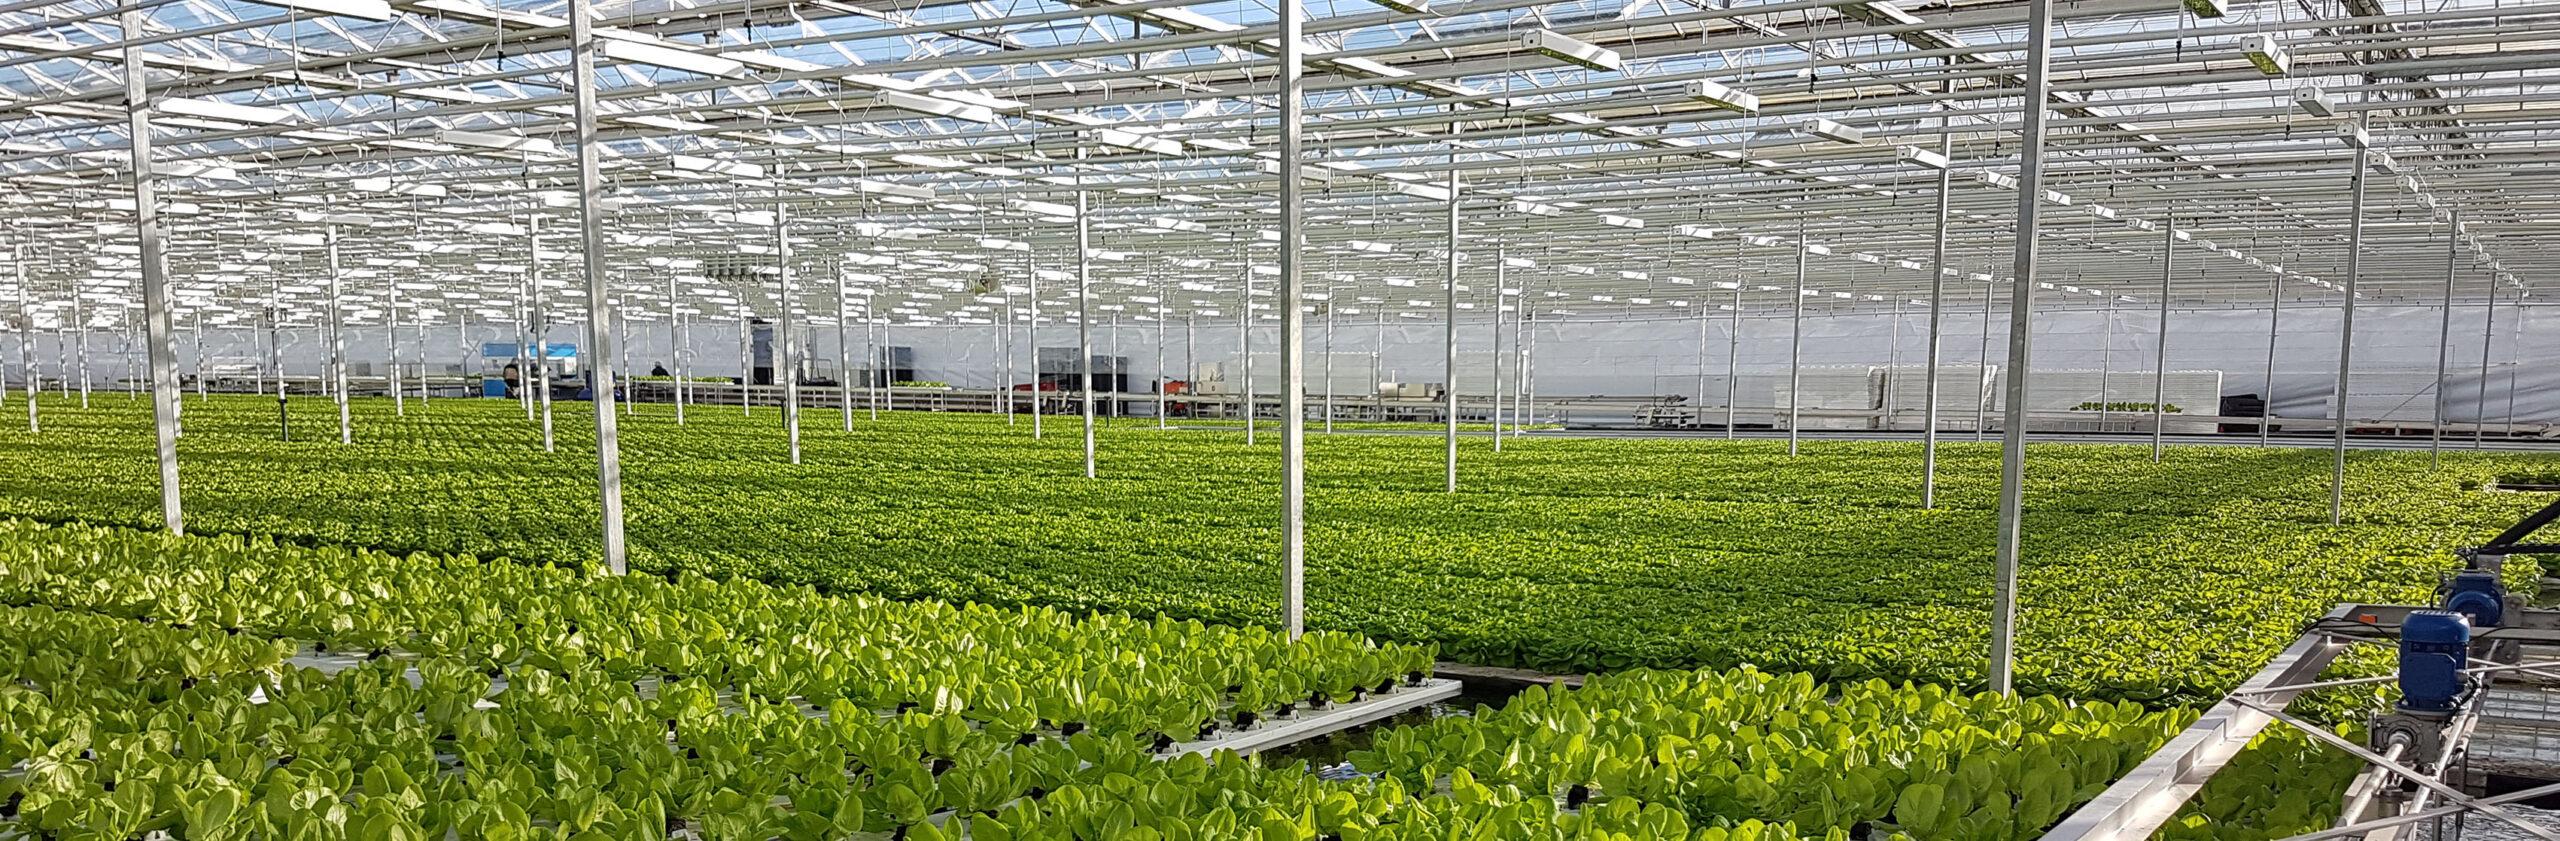 Glastuinbouw automatisering